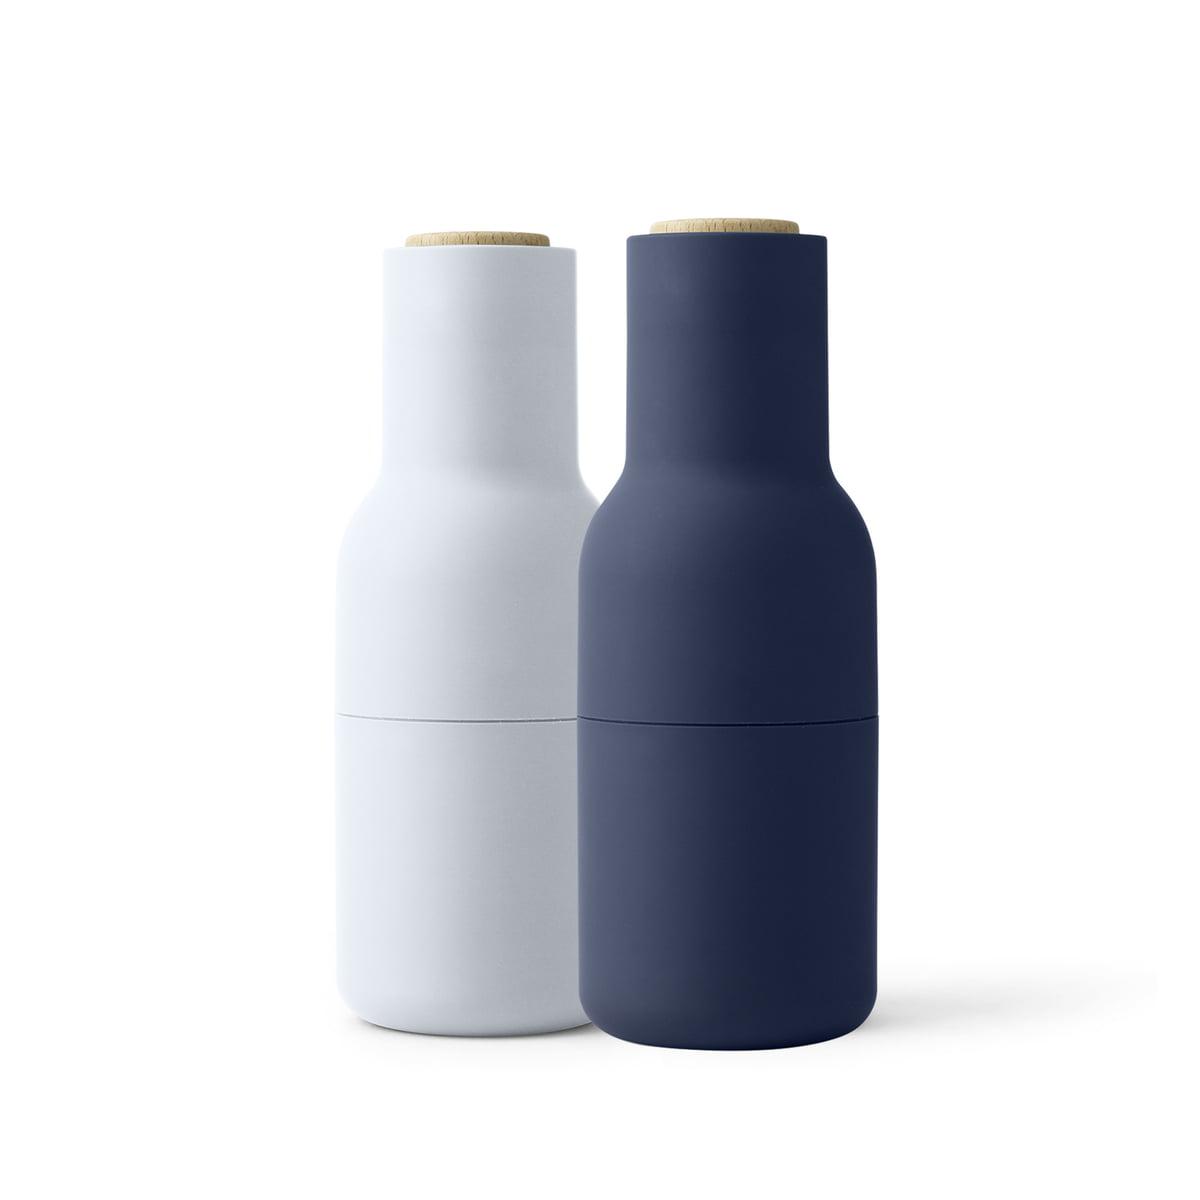 menu bottle salz und pfefferm hlen set classic blue. Black Bedroom Furniture Sets. Home Design Ideas